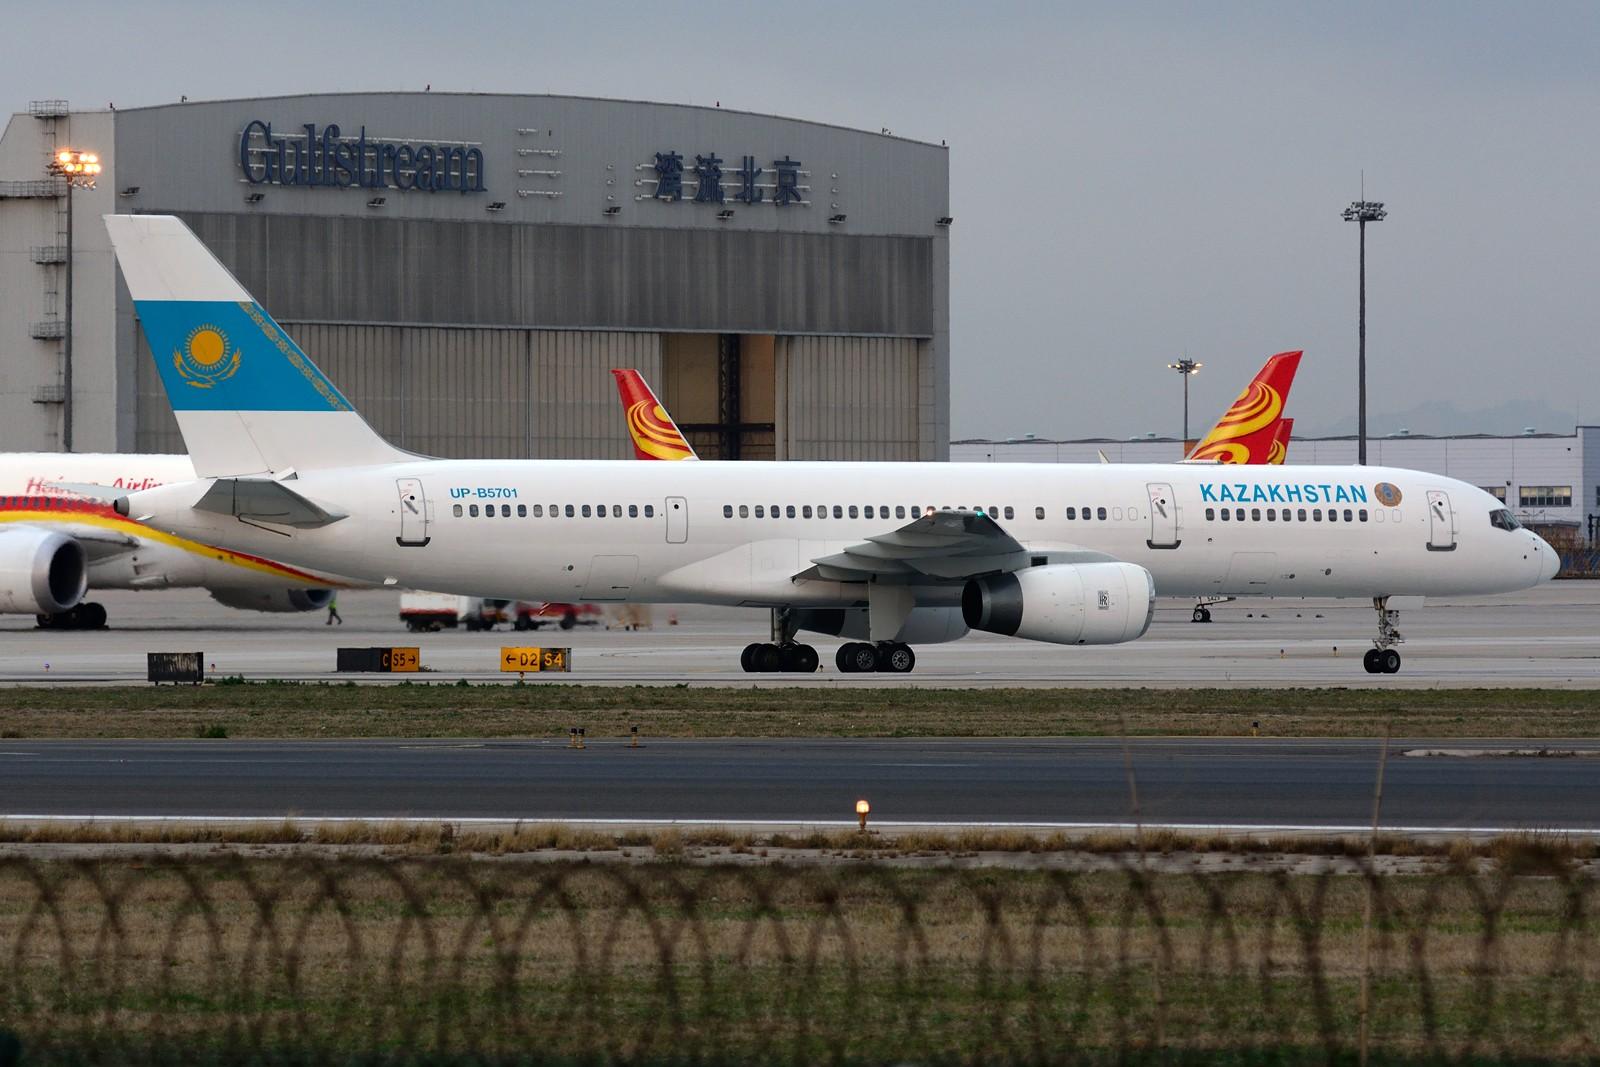 Re:[原创]【PEK】~土库曼斯坦&哈萨克斯坦~ BOEING 757-200 UP-B5701 中国北京首都国际机场